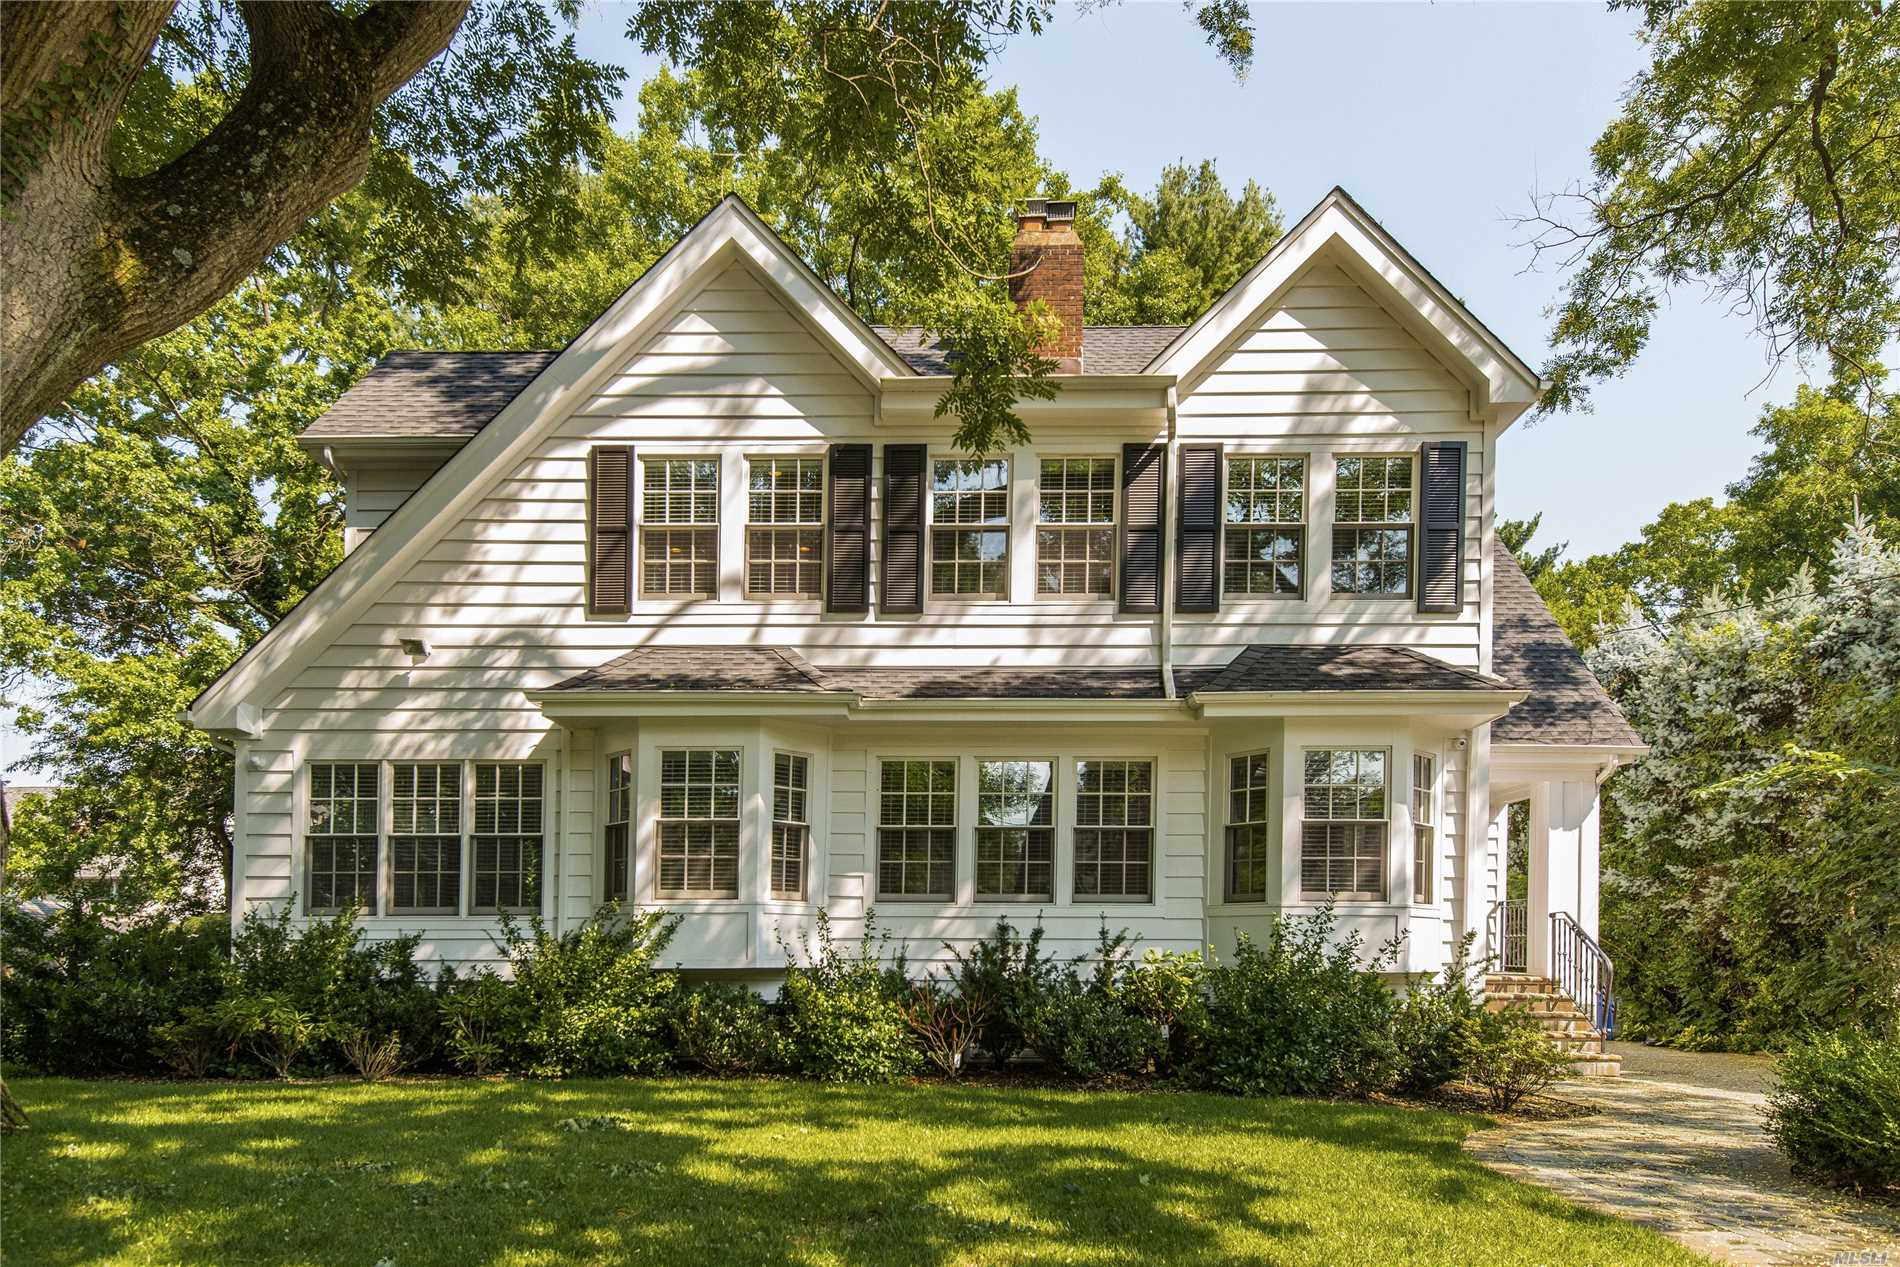 Photo of home for sale at 261 Ridge Rd, Douglaston NY